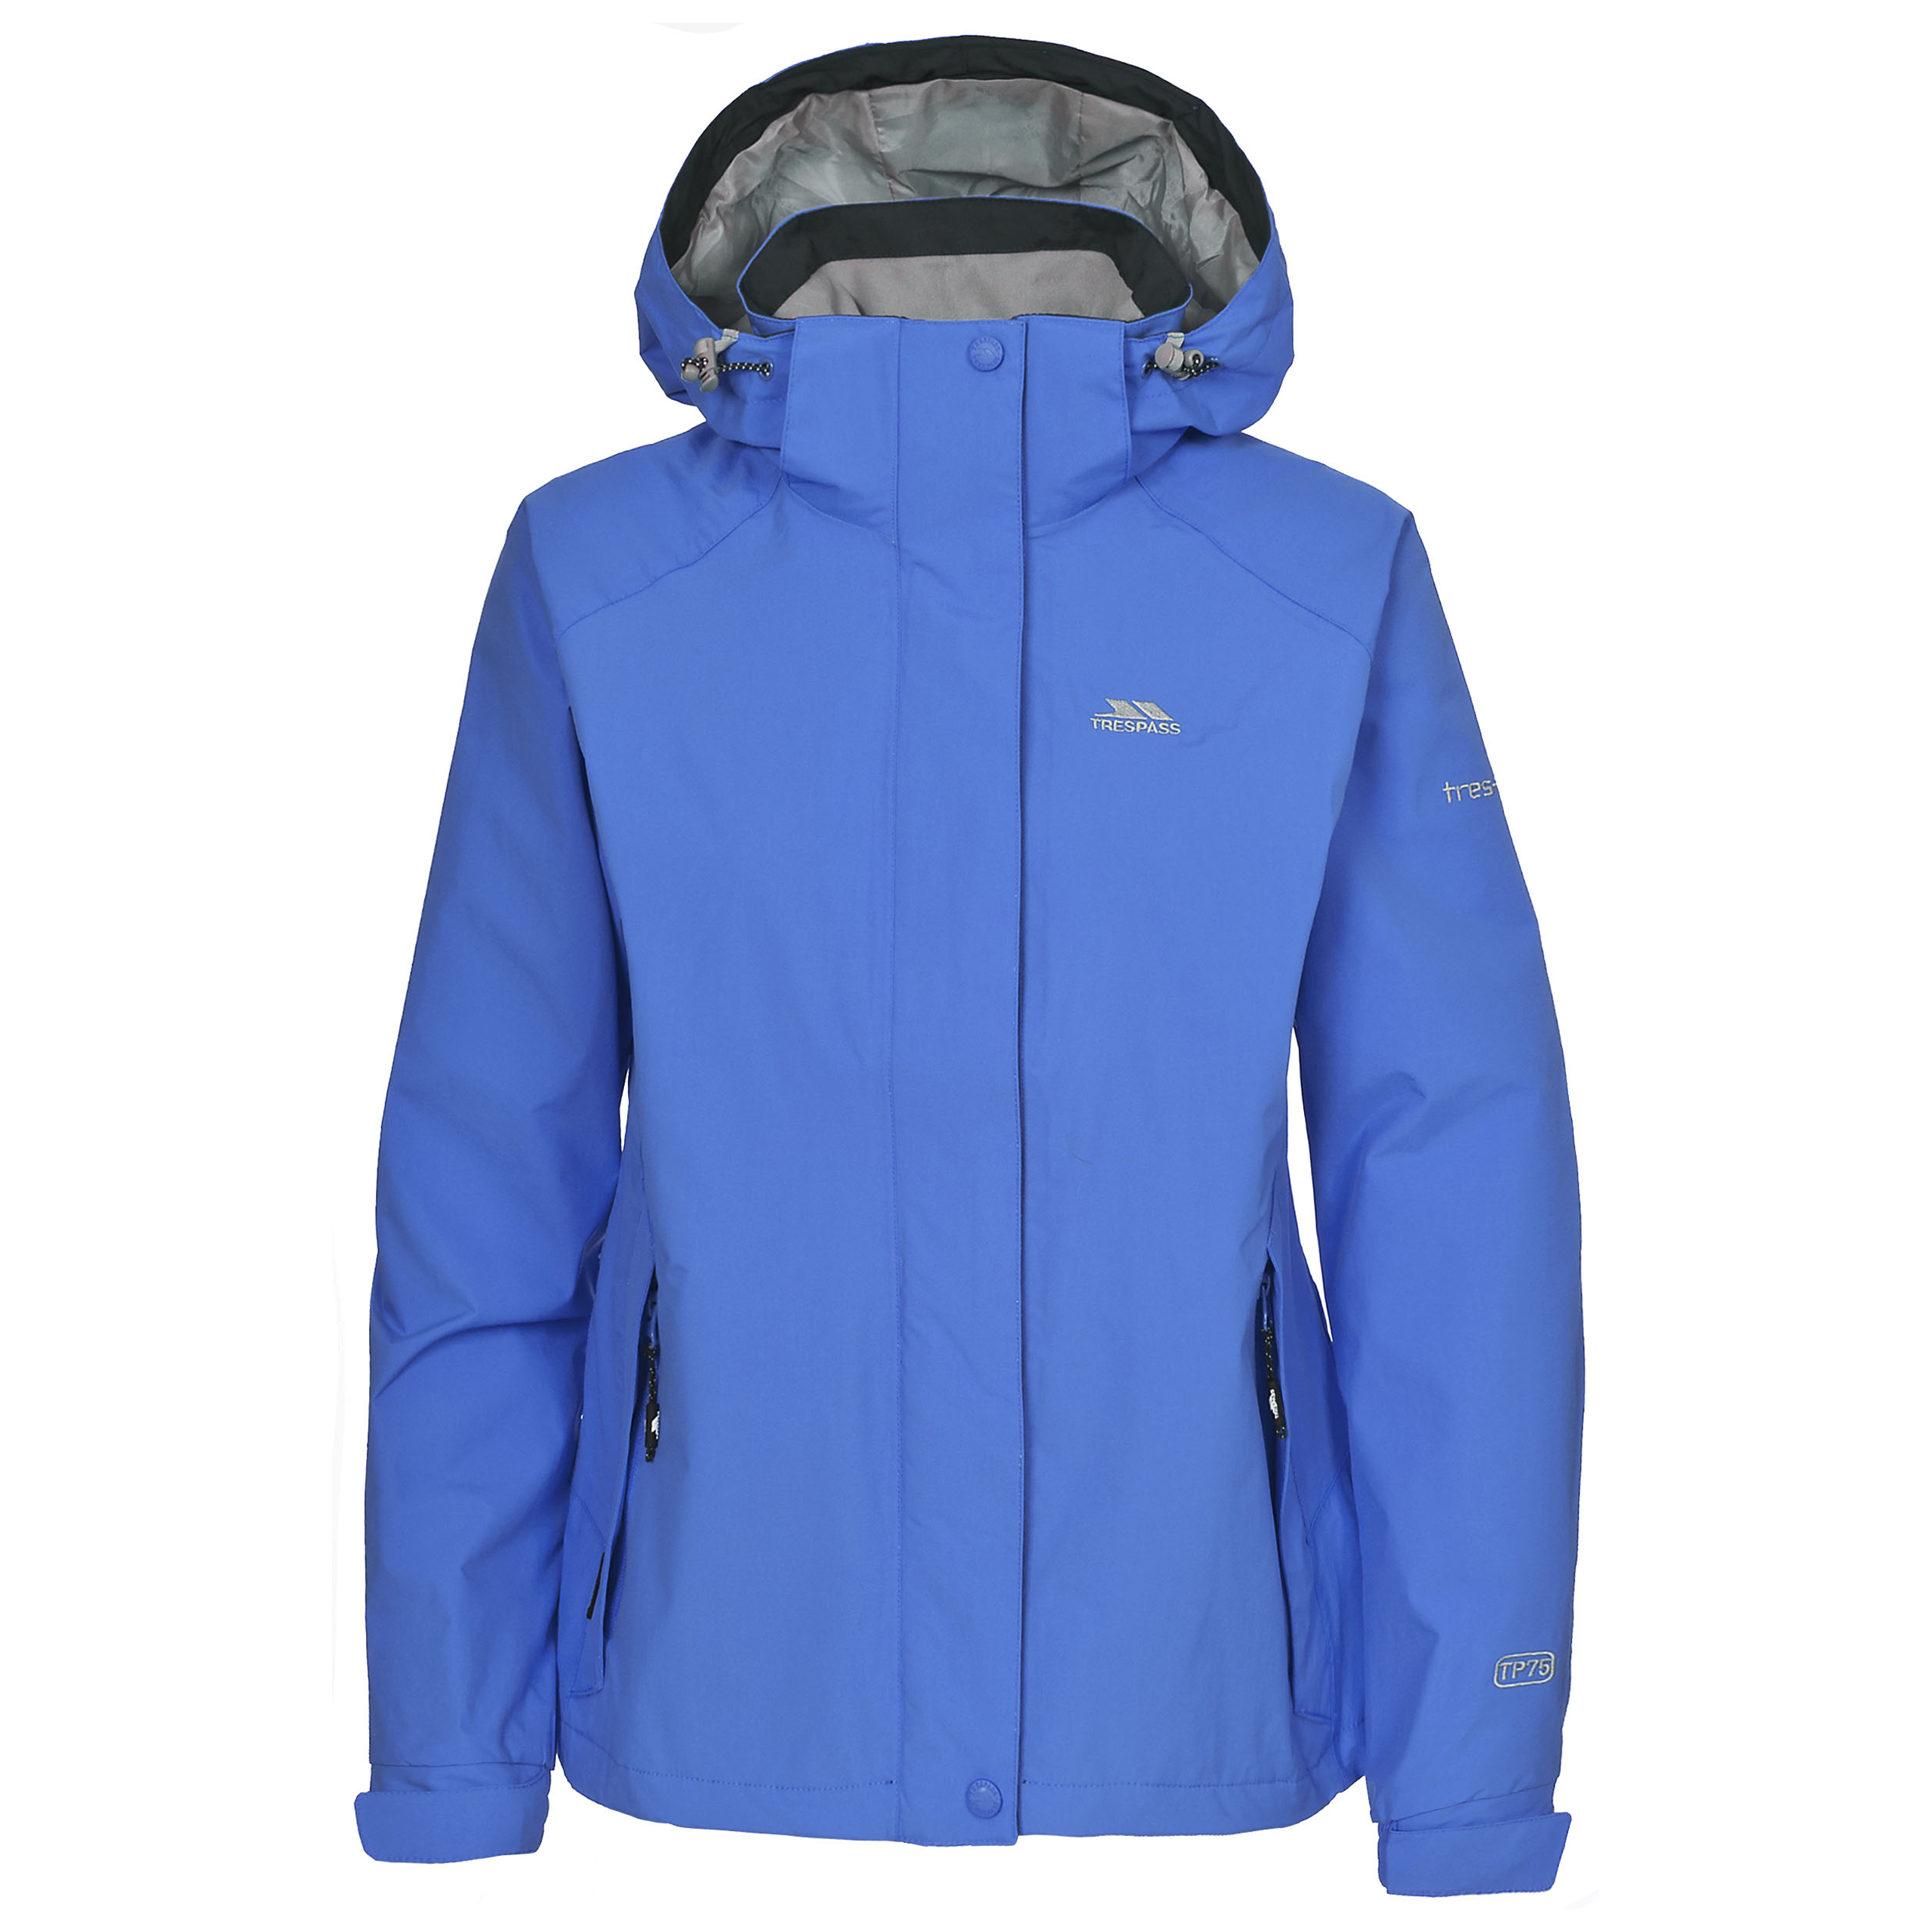 Trespass-Florissant-Womens-Waterproof-Jacket-Black-Navy-Rain-Coat-with-Hood